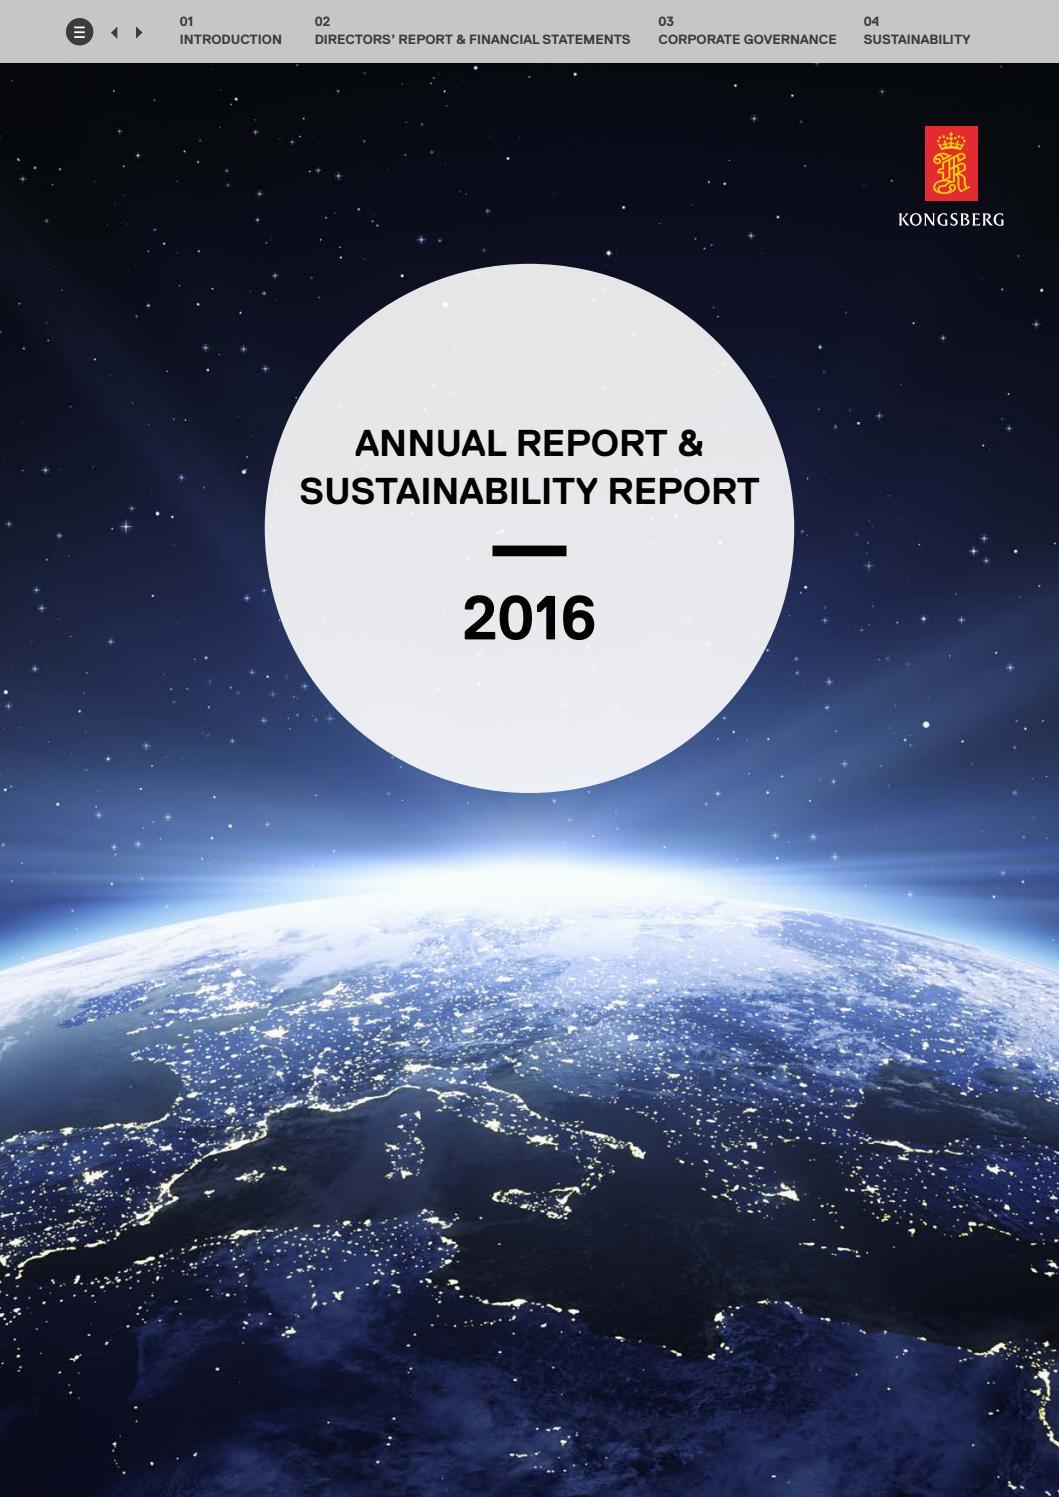 KONGSBERG ANNUAL REPORT & SUSTAINABILITY REPORT 2016 by Kongsberg Gruppen -  issuu